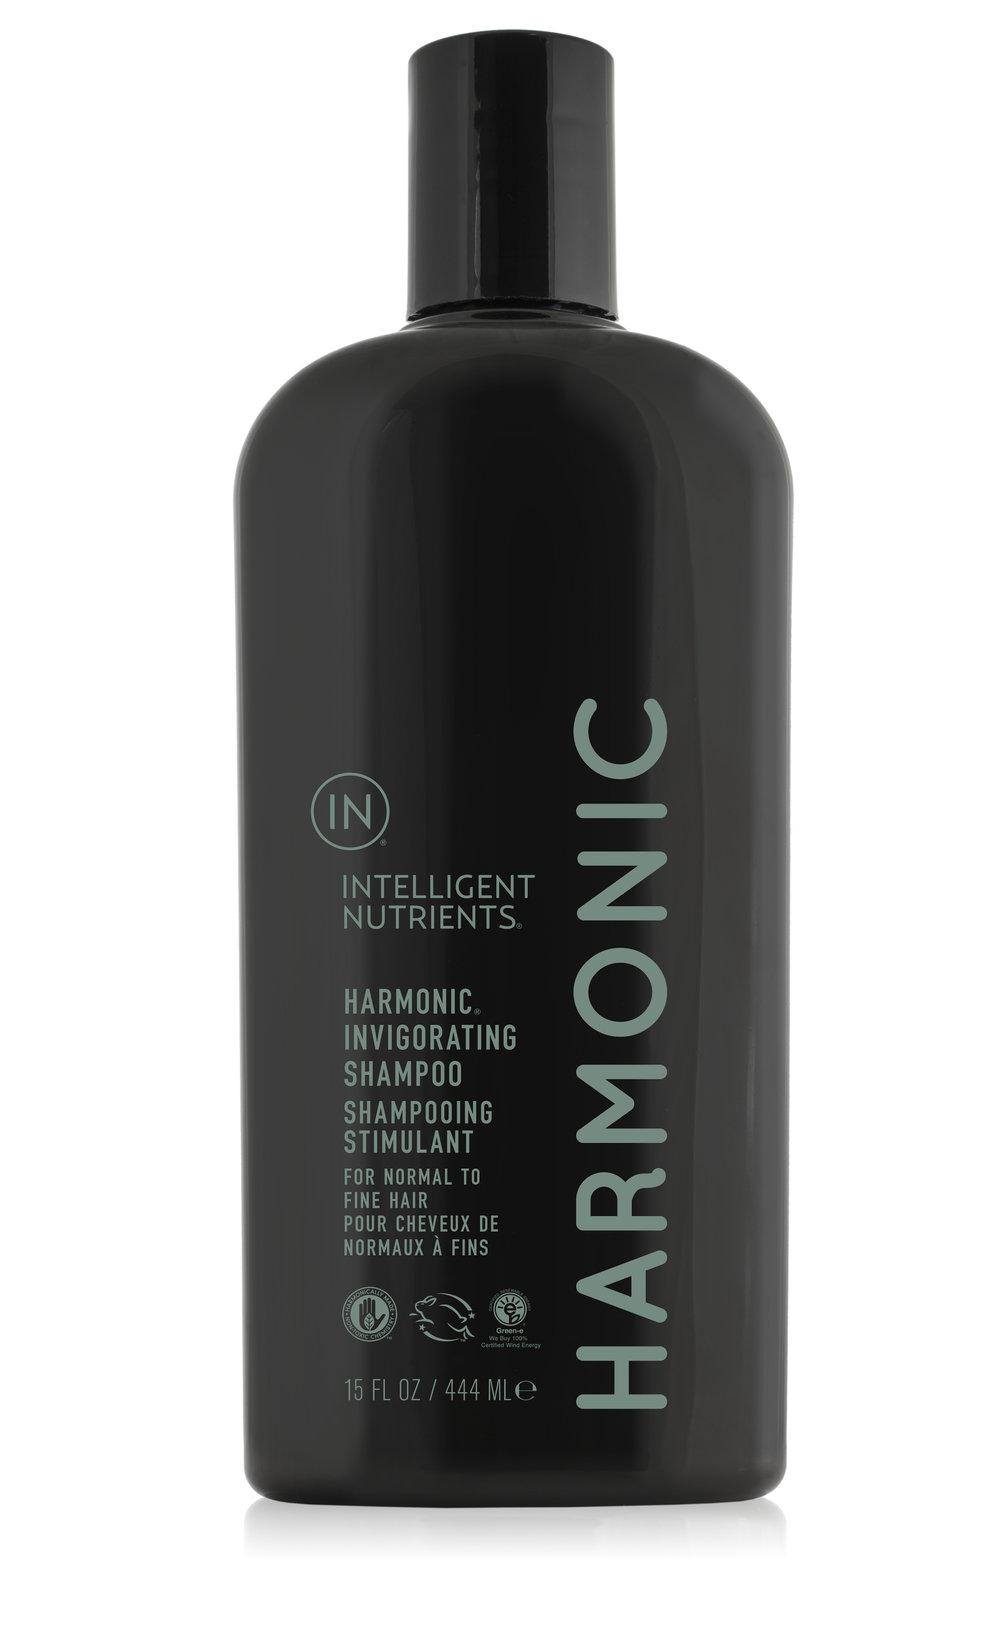 Harmonic Shampoo (DKK245/444ml)